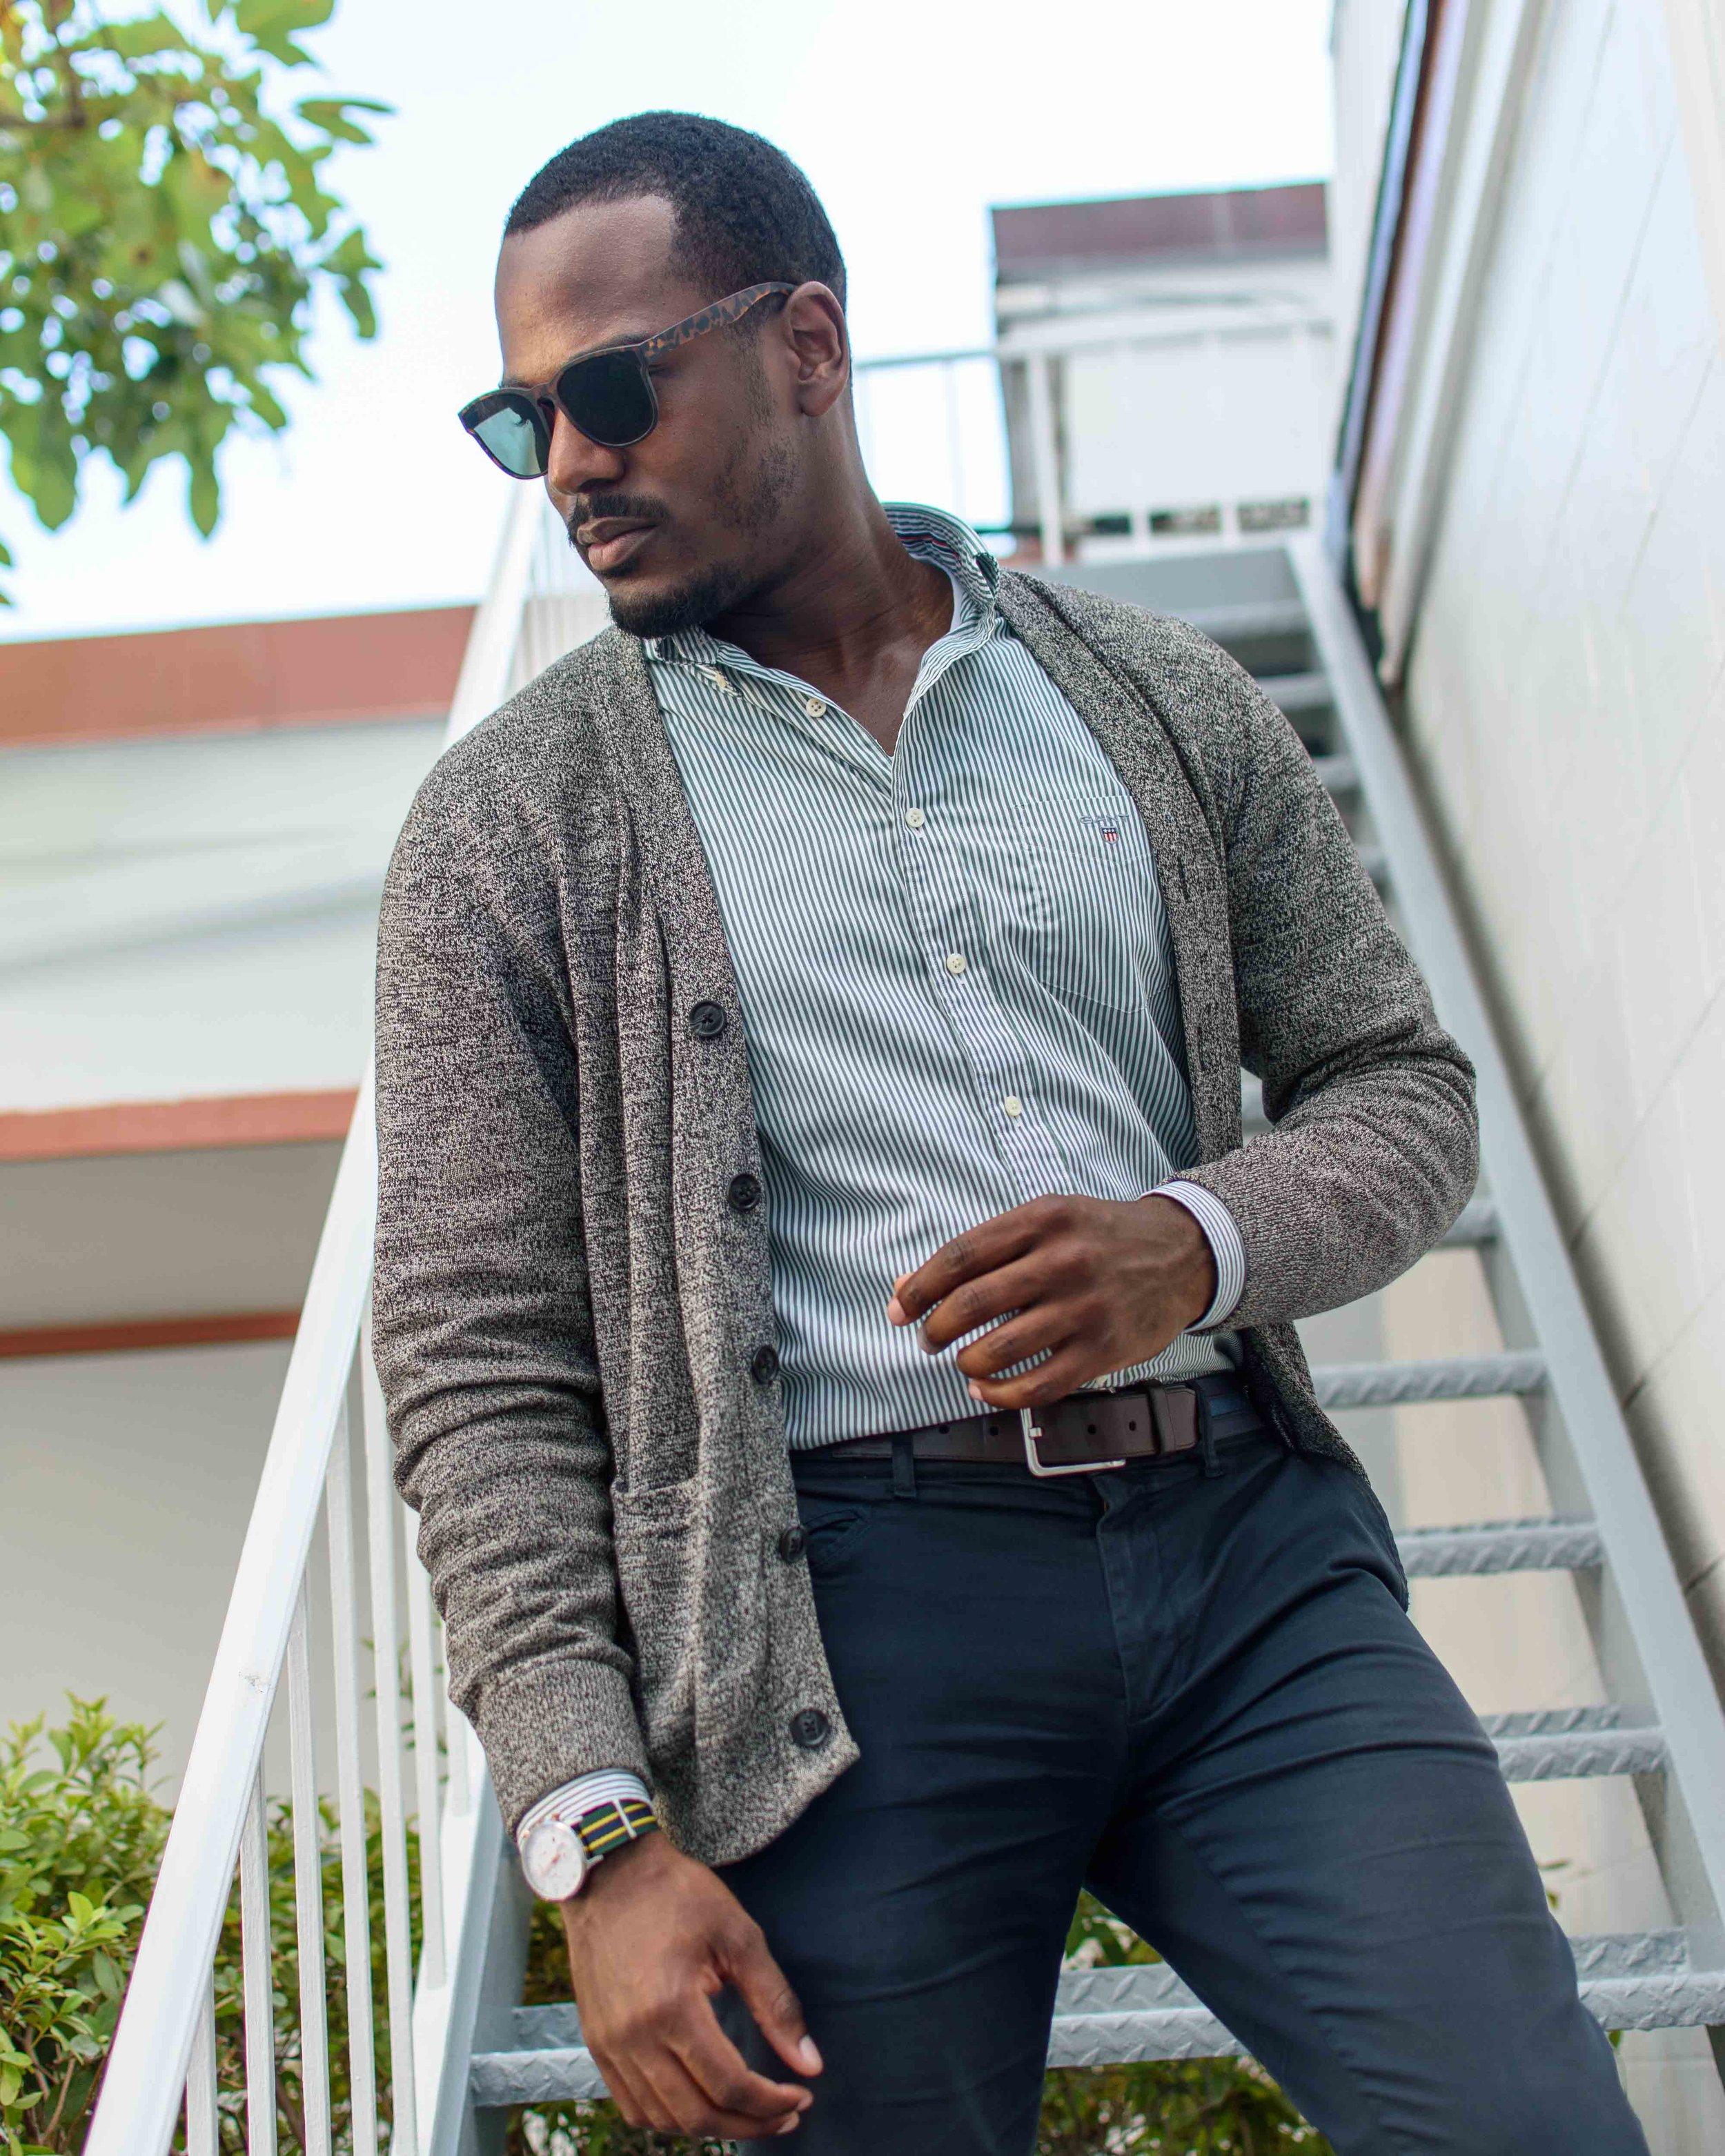 gant slim fit banker striped shirt pine green greg mcgregorson gregsstyleguide.JPG